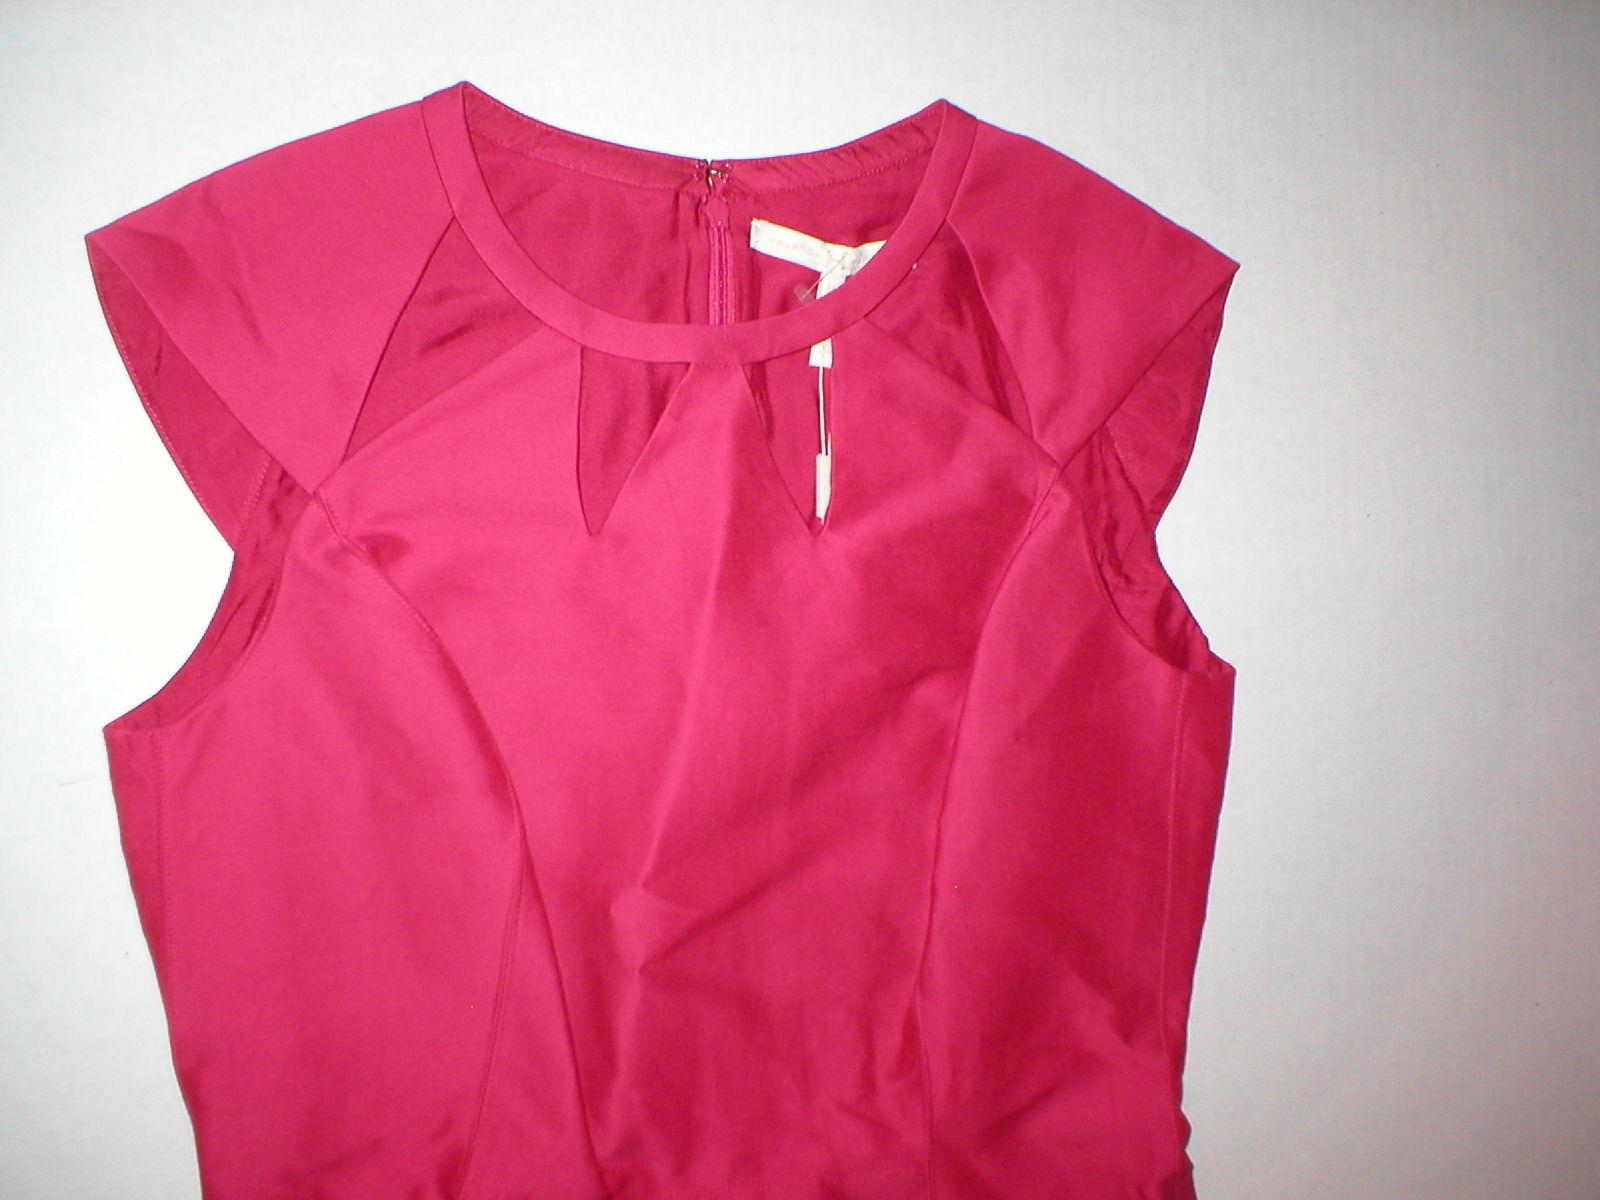 New $495 Womens Halston Heritage 6 Dress Designer Dark Pink NWT Cut Out Neck image 5